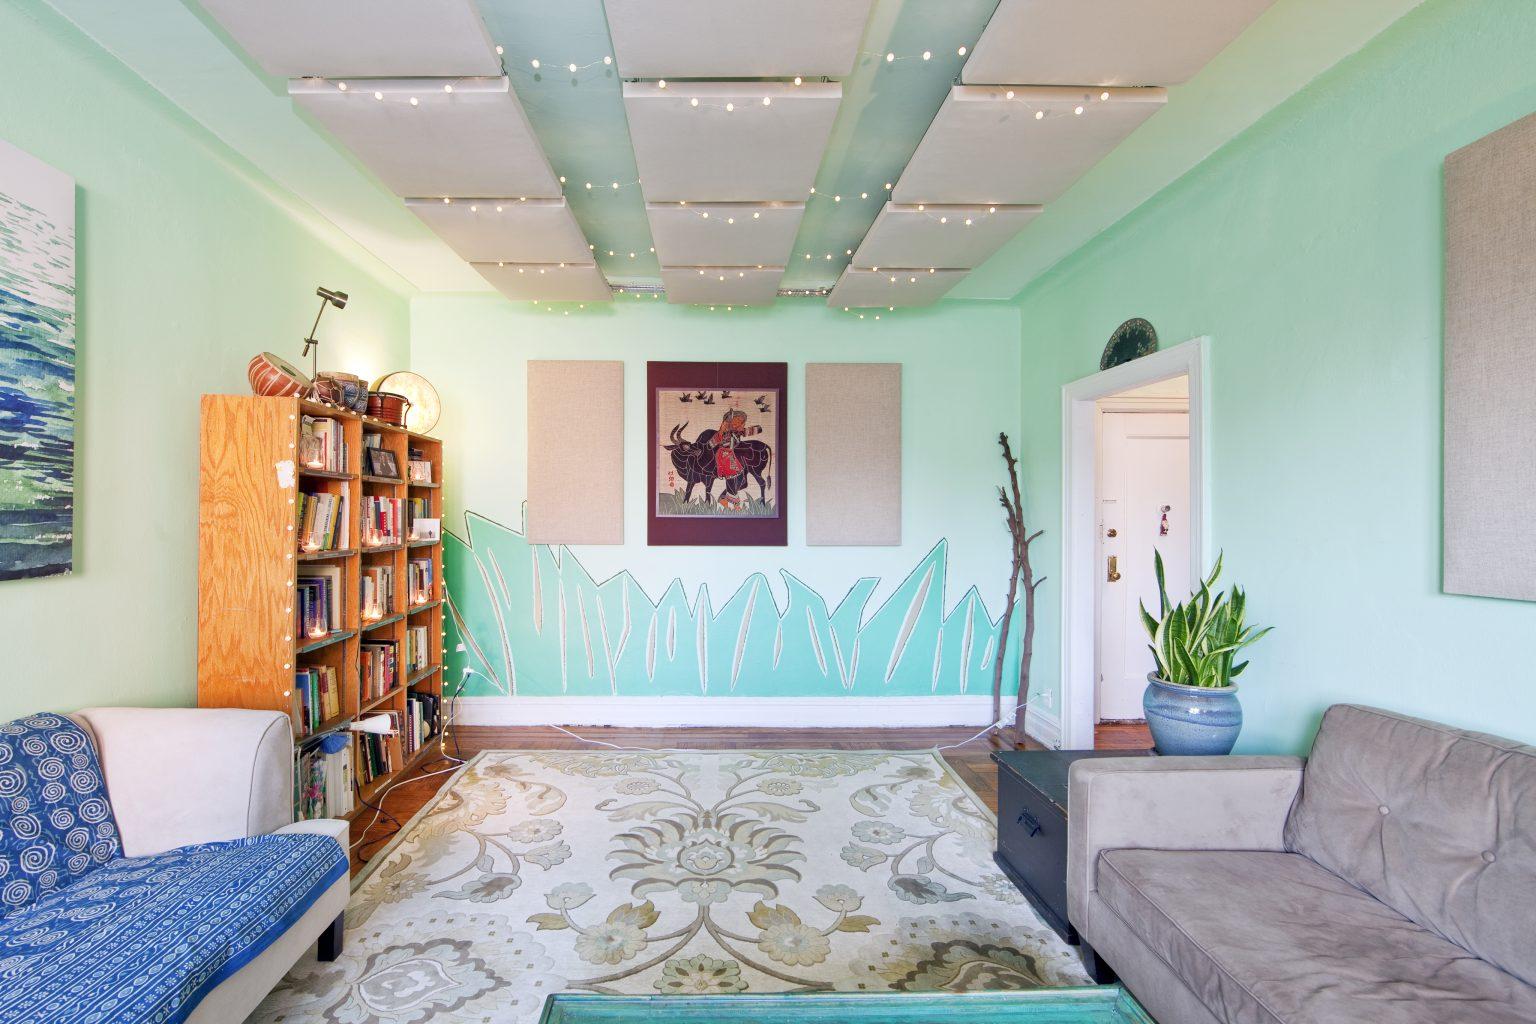 Jess Duda's Living Room Turned Recording Studio I The Day Job Artist